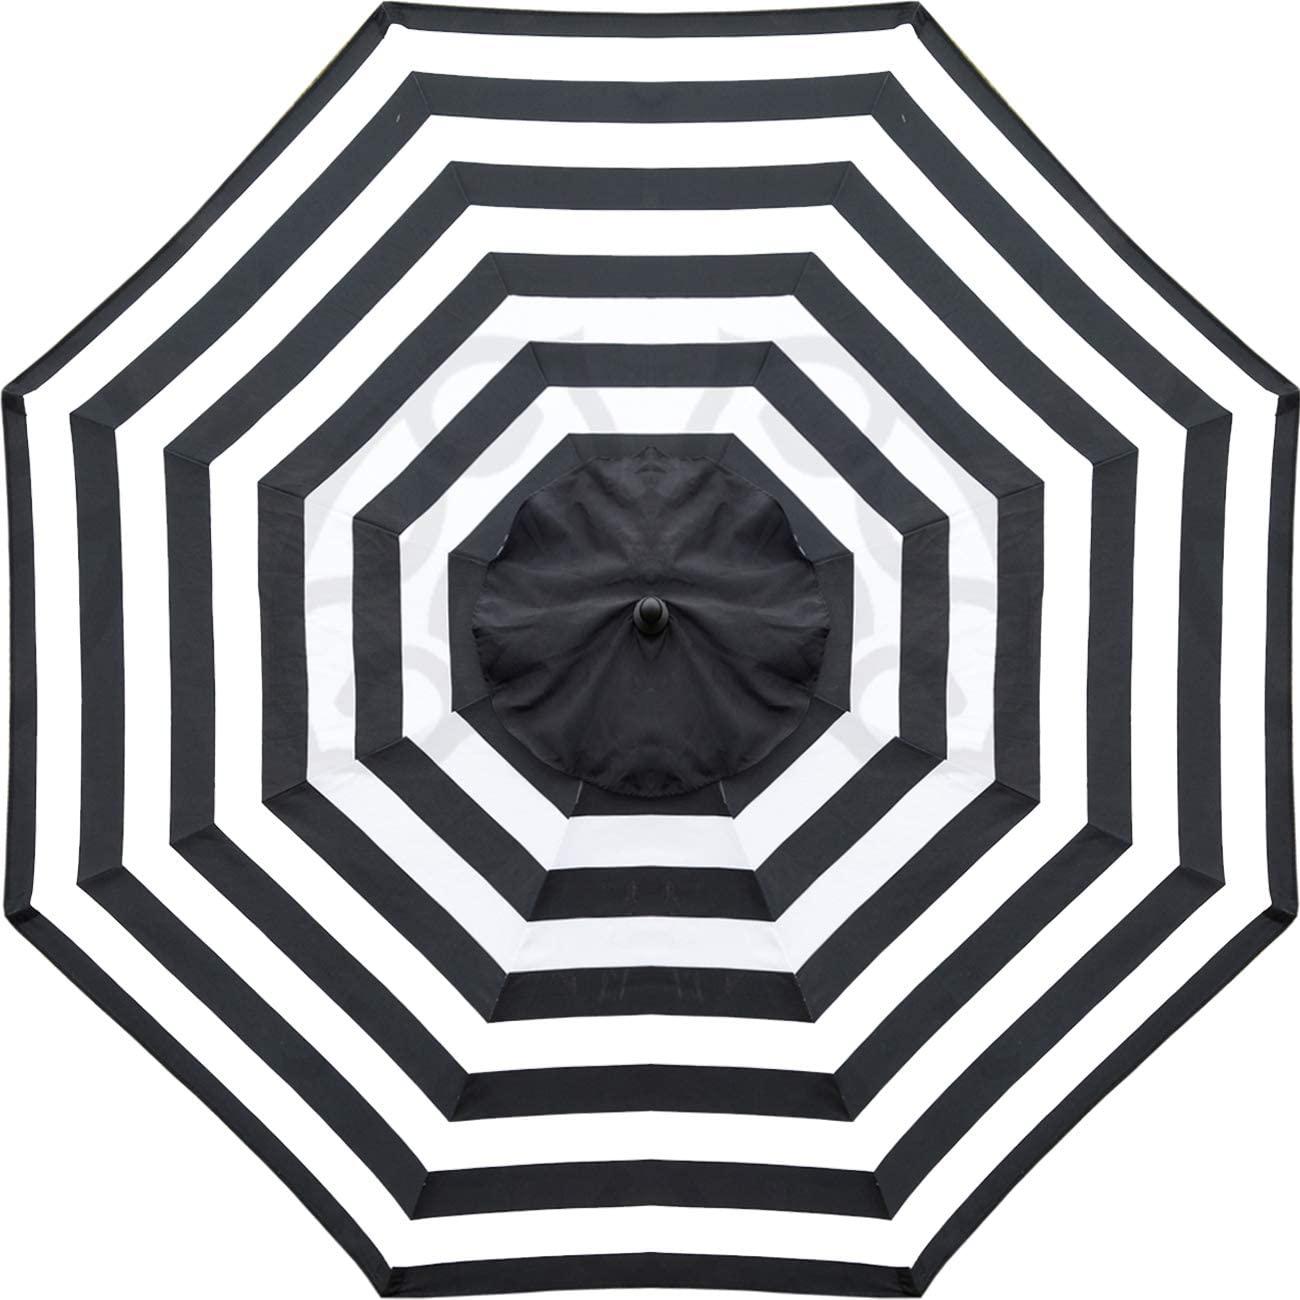 Heininger 1305 Destination Gear Italian Stripe Black And White 7 5 Ft Patio For Sale Online Ebay